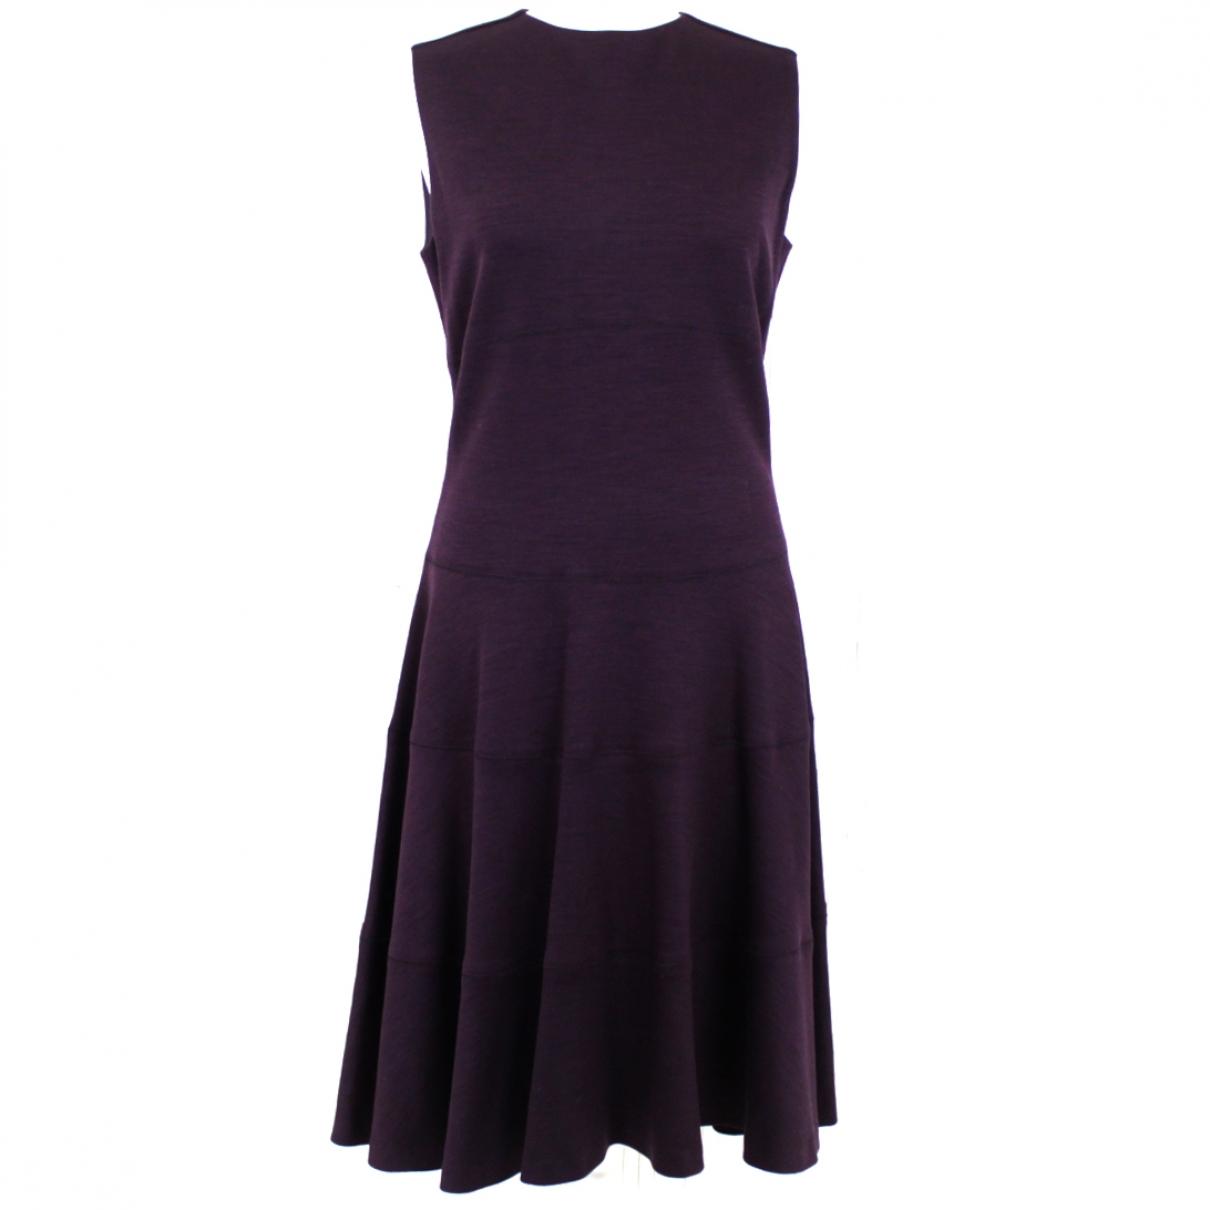 Joseph \N Kleid in  Lila Wolle